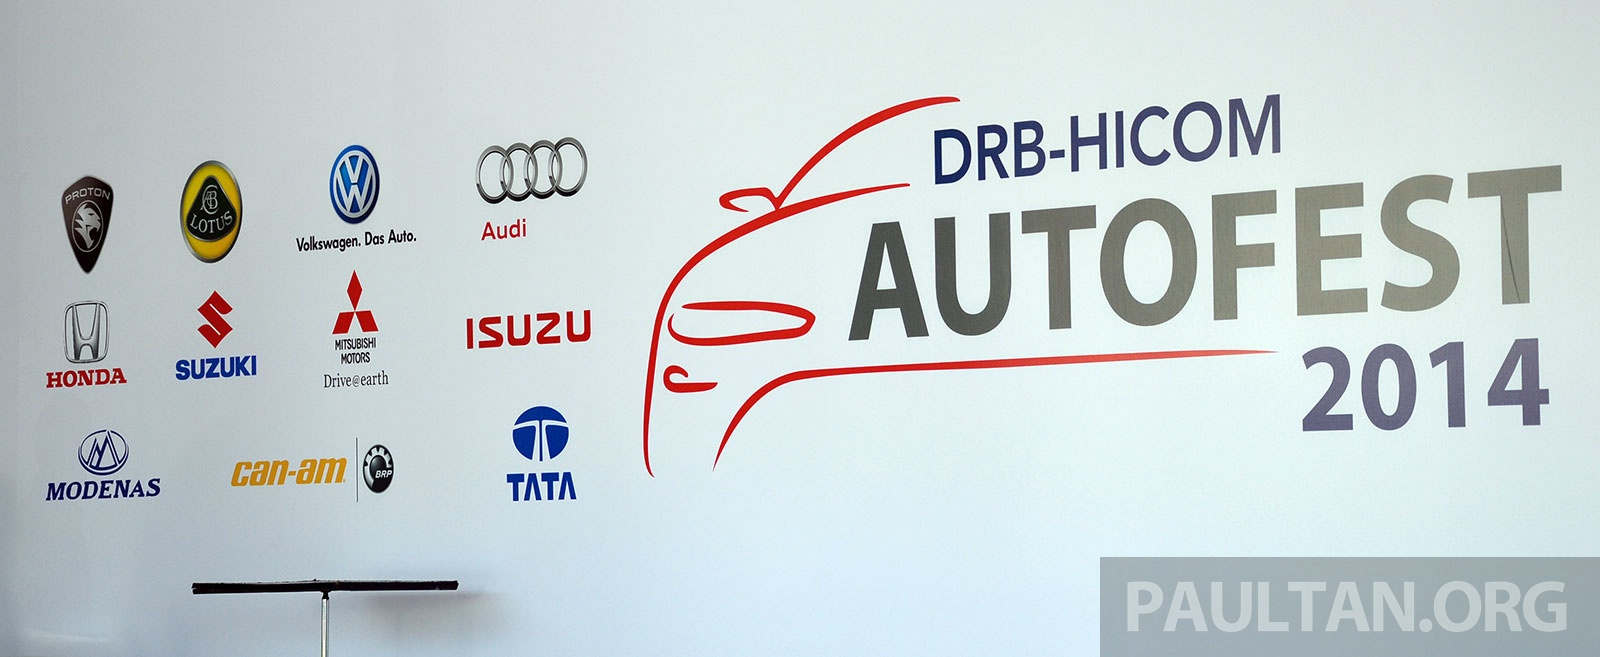 All Car Brands >> DRB-Hicom Autofest 2014 @ EON Complex Glenmarie – eight car brands and two bike brands gathered ...